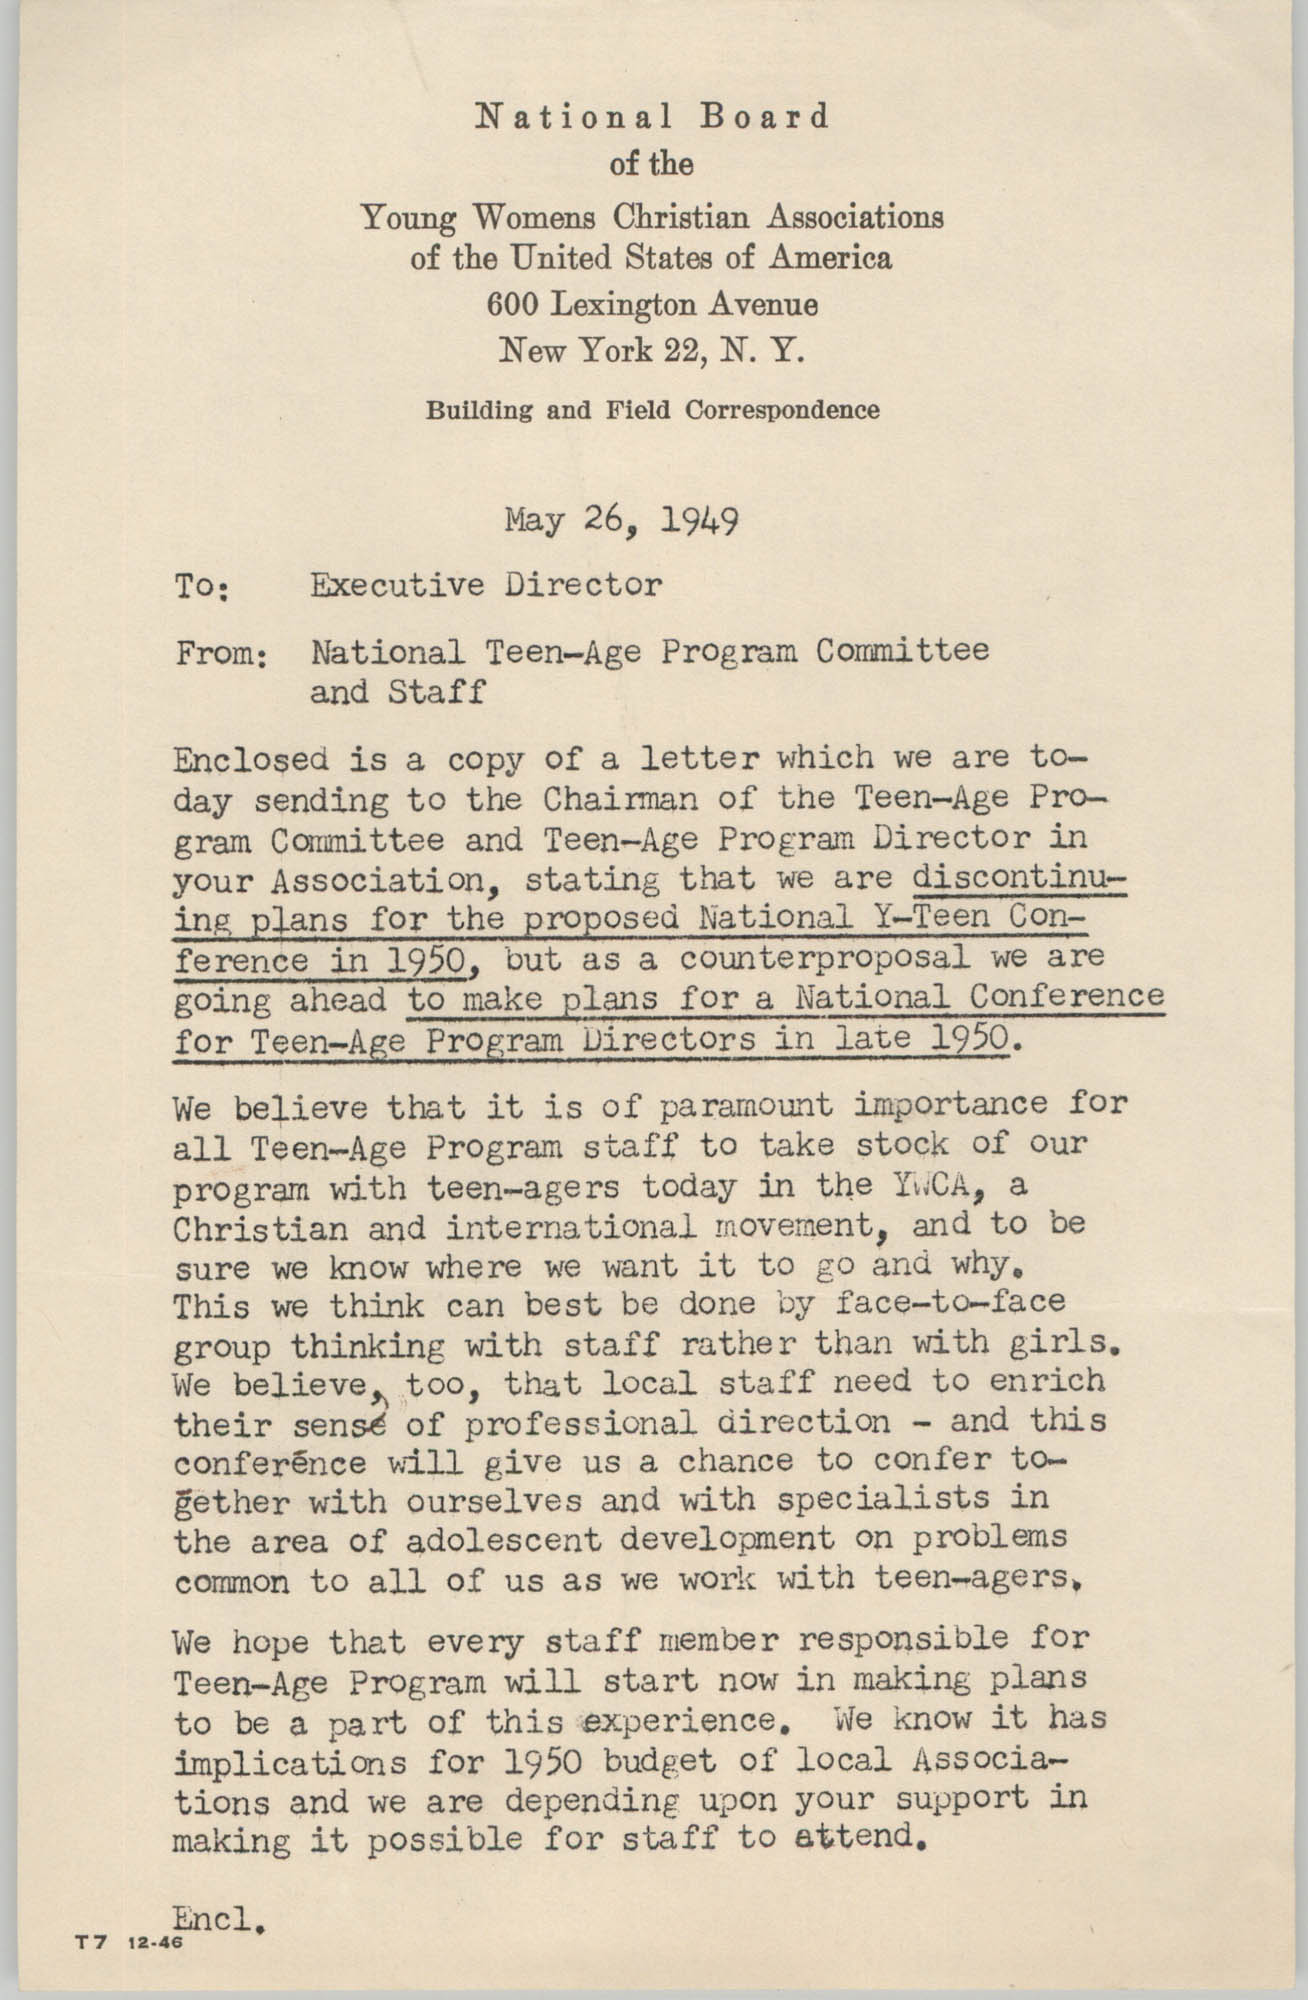 National Board of the Y.W.C.A. Memorandum, May 26, 1949